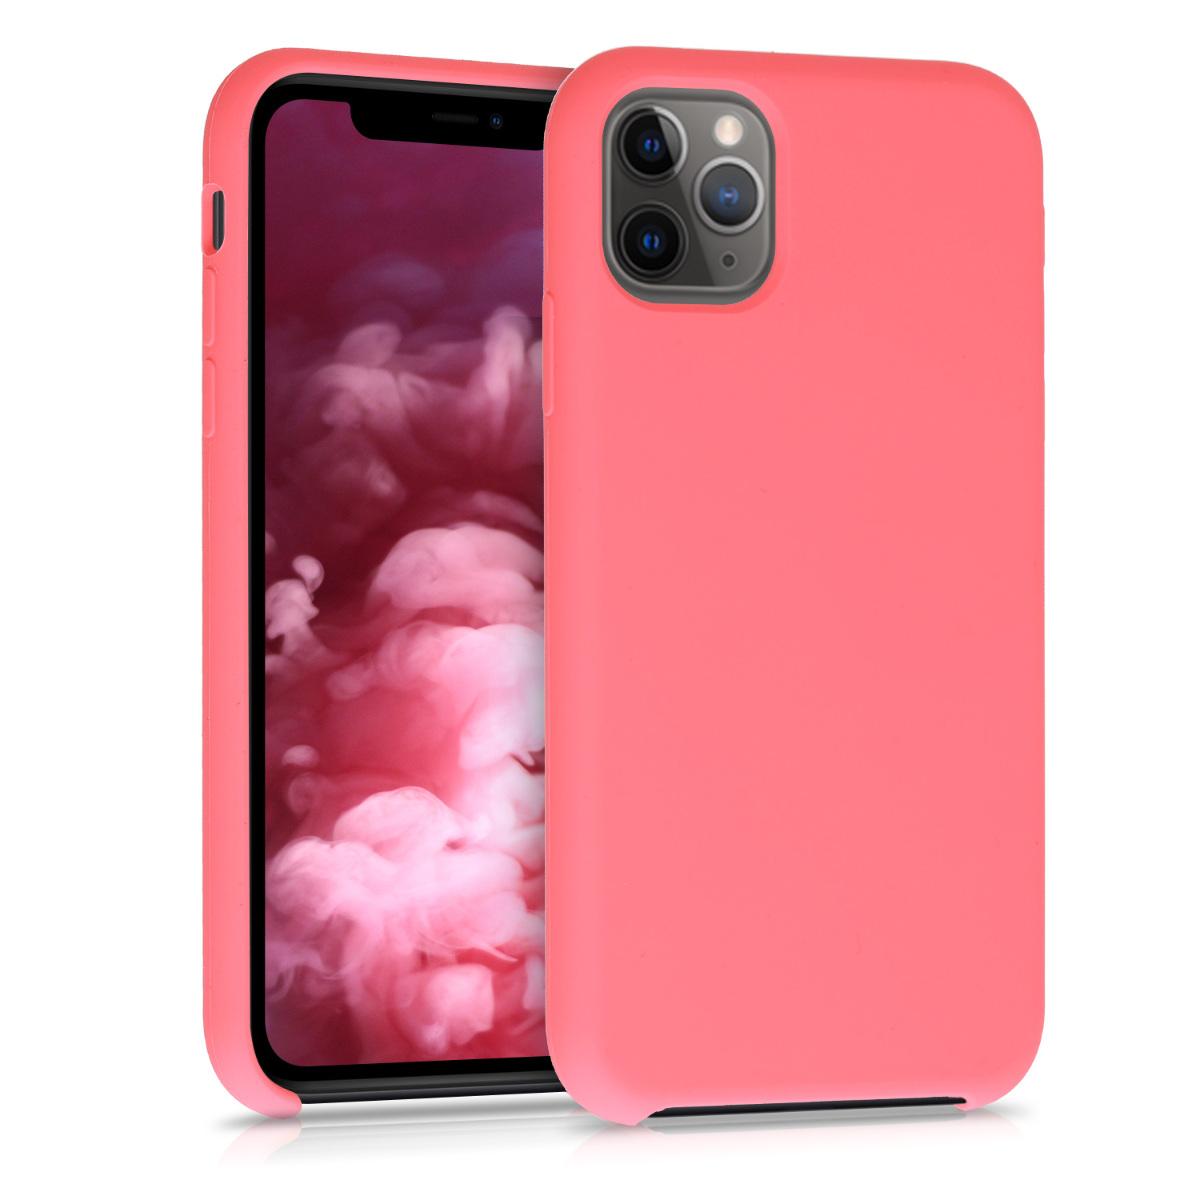 KW Θήκη Σιλικόνης Apple iPhone 11 Pro Max - Soft Flexible Rubber - Neon Coral (49725.103)